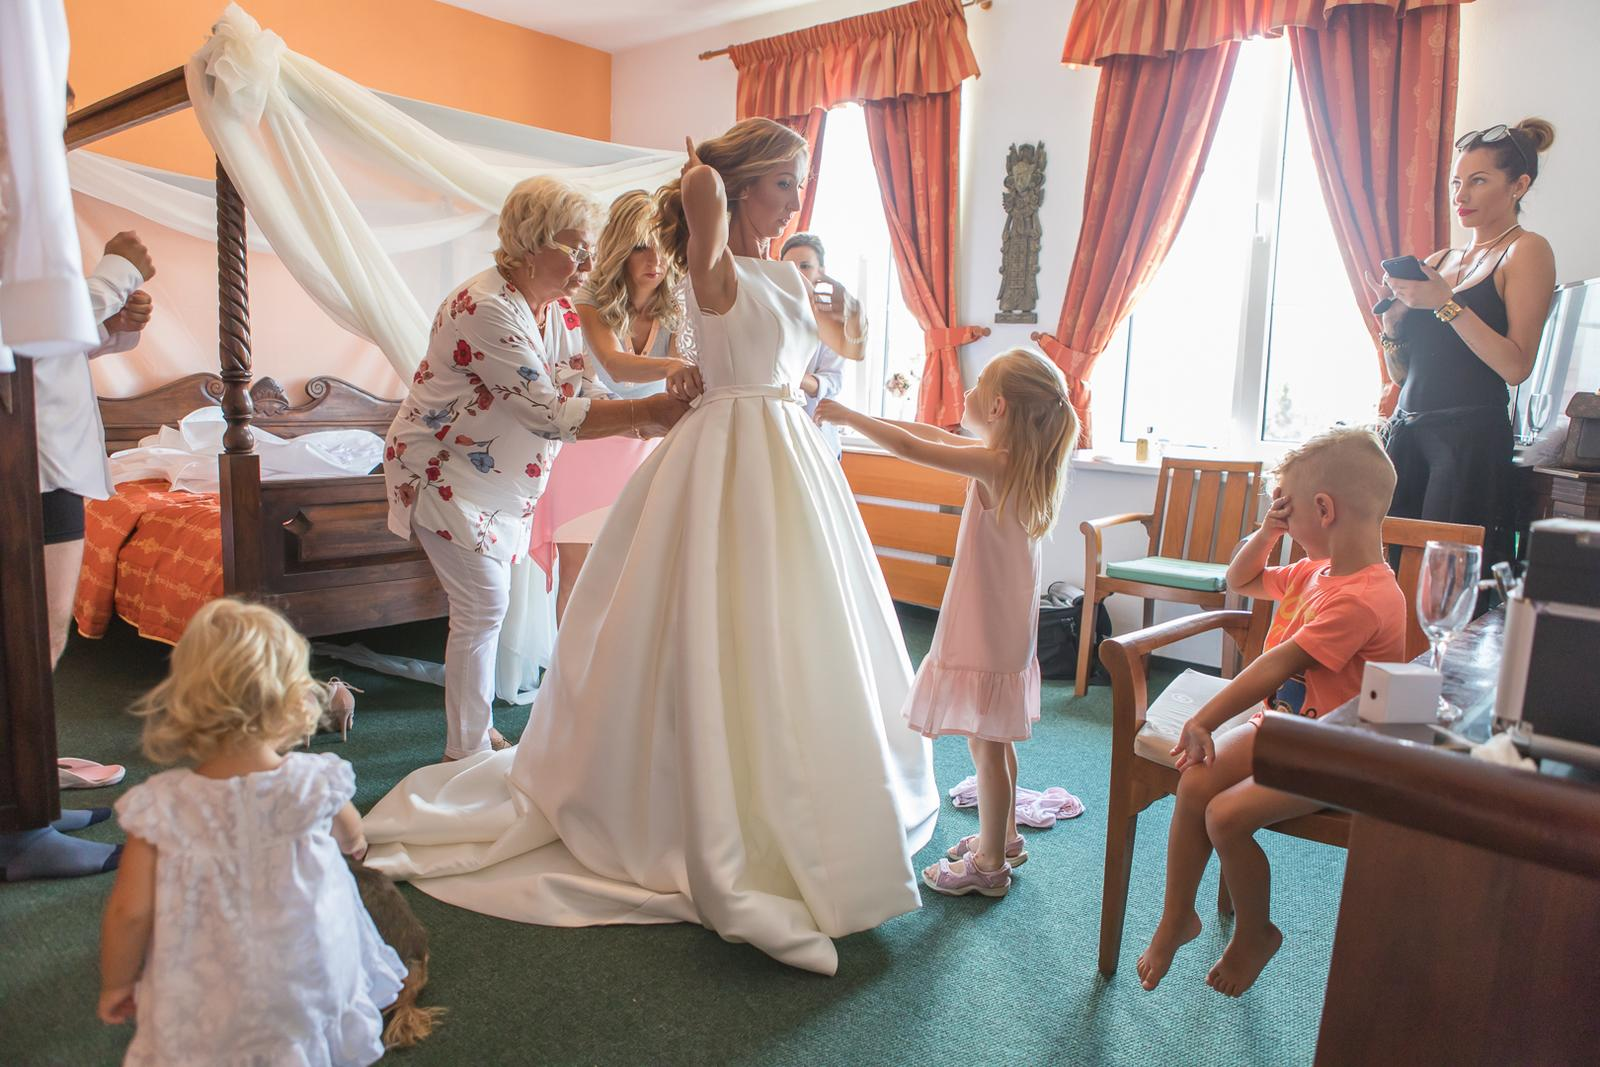 pavolpiroha - Svadobný zhon